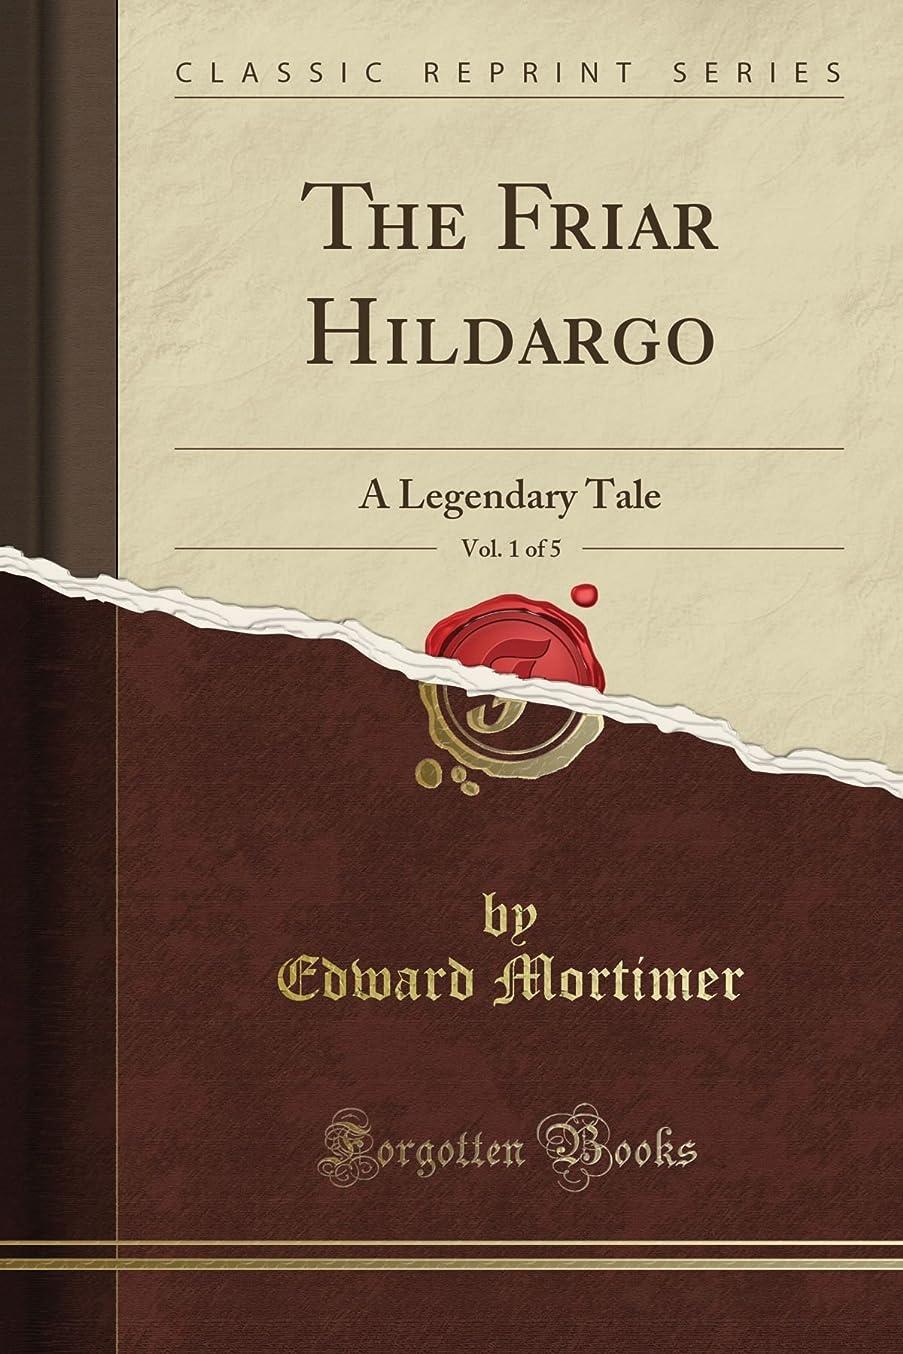 議題講堂卒業記念アルバムThe Friar Hildargo: A Legendary Tale, Vol. 1 of 5 (Classic Reprint)